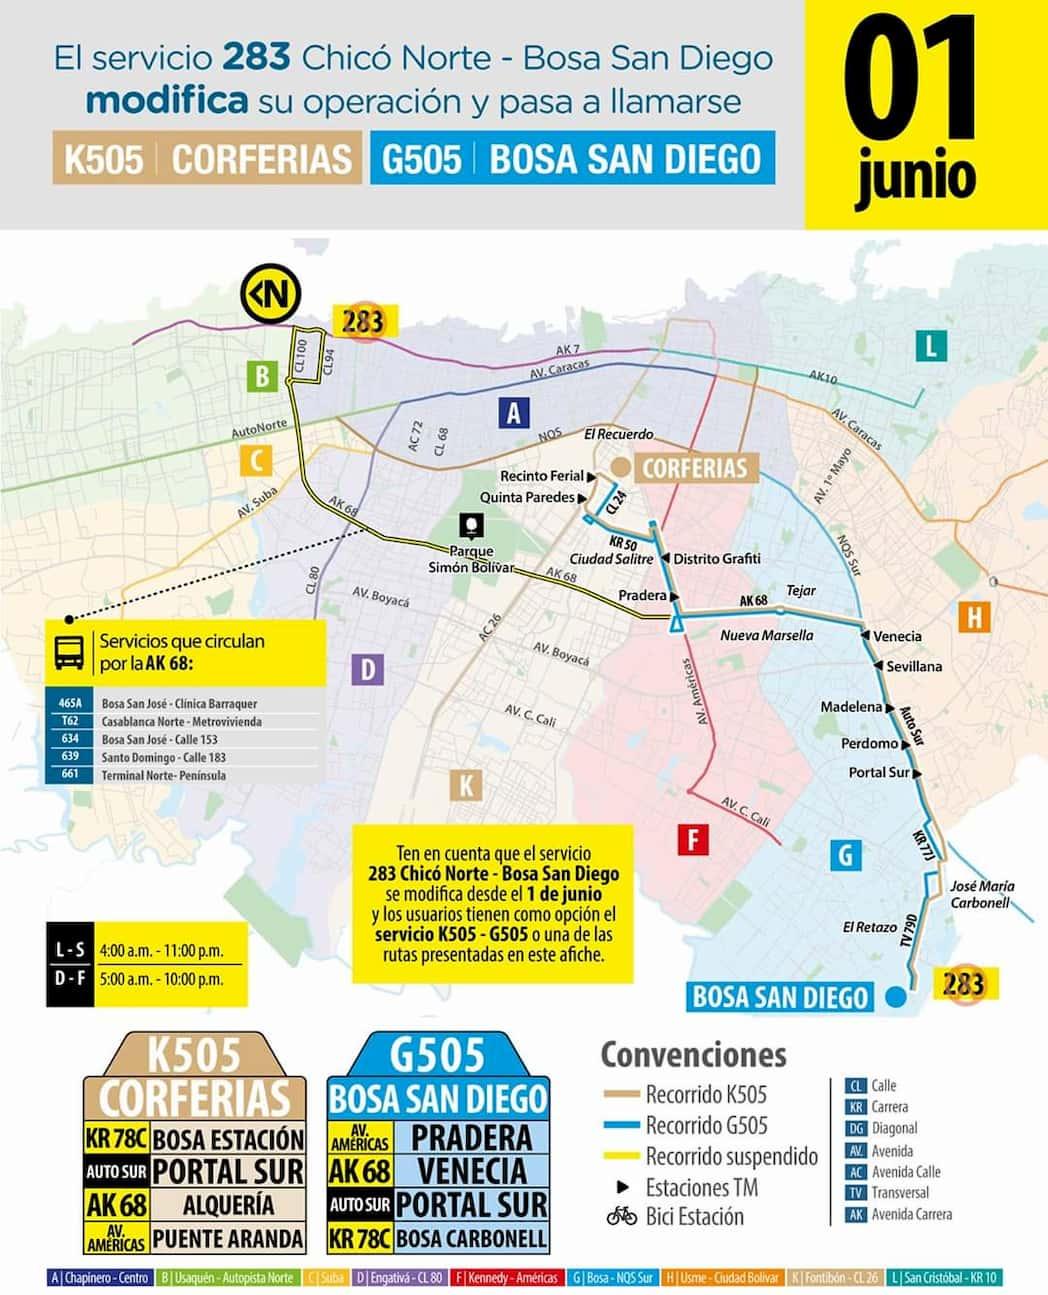 G505 / K 505 Bosa San Diego - Corferias, mapa bus urbano Bogotá